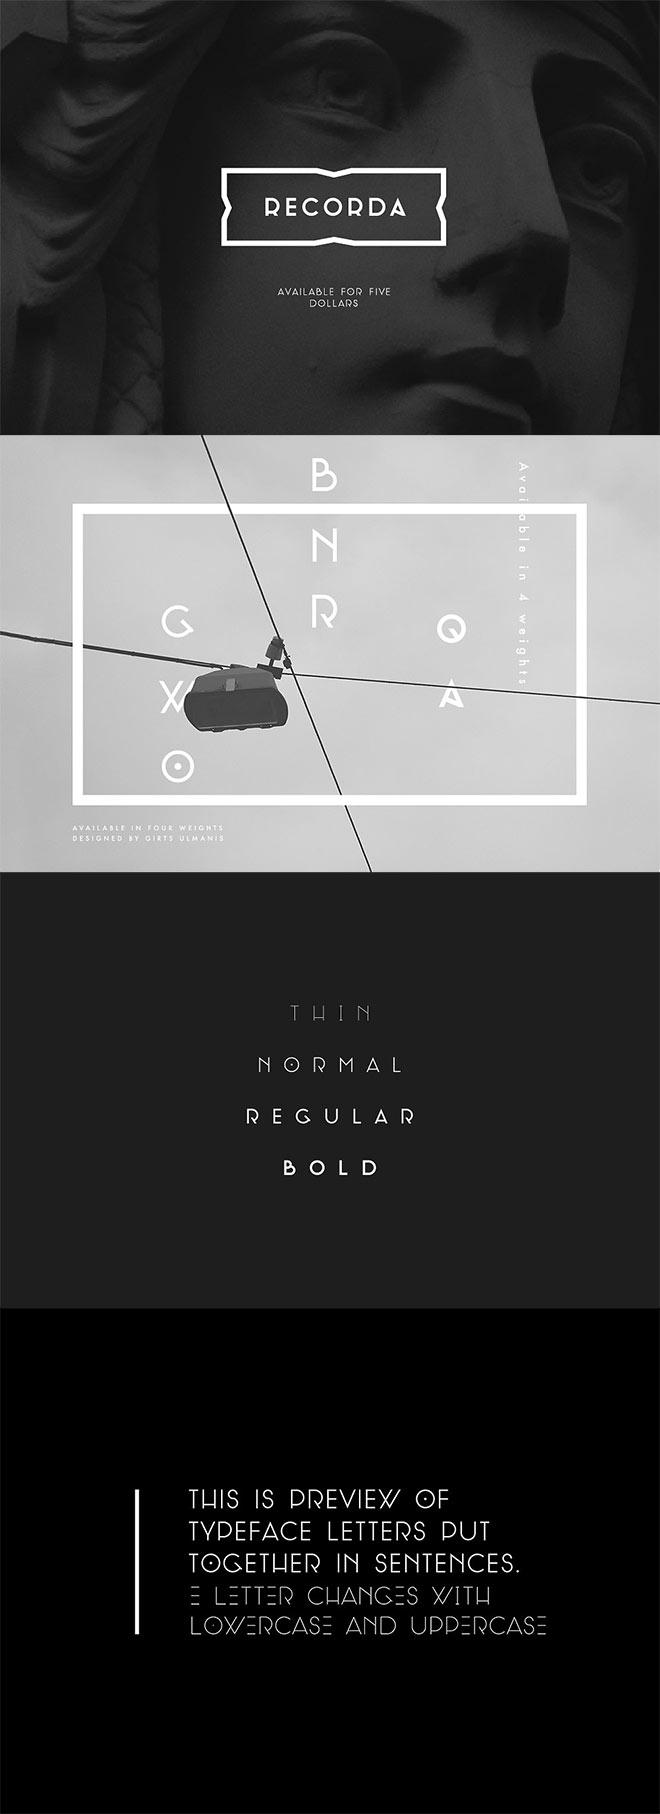 RECORDA Typeface